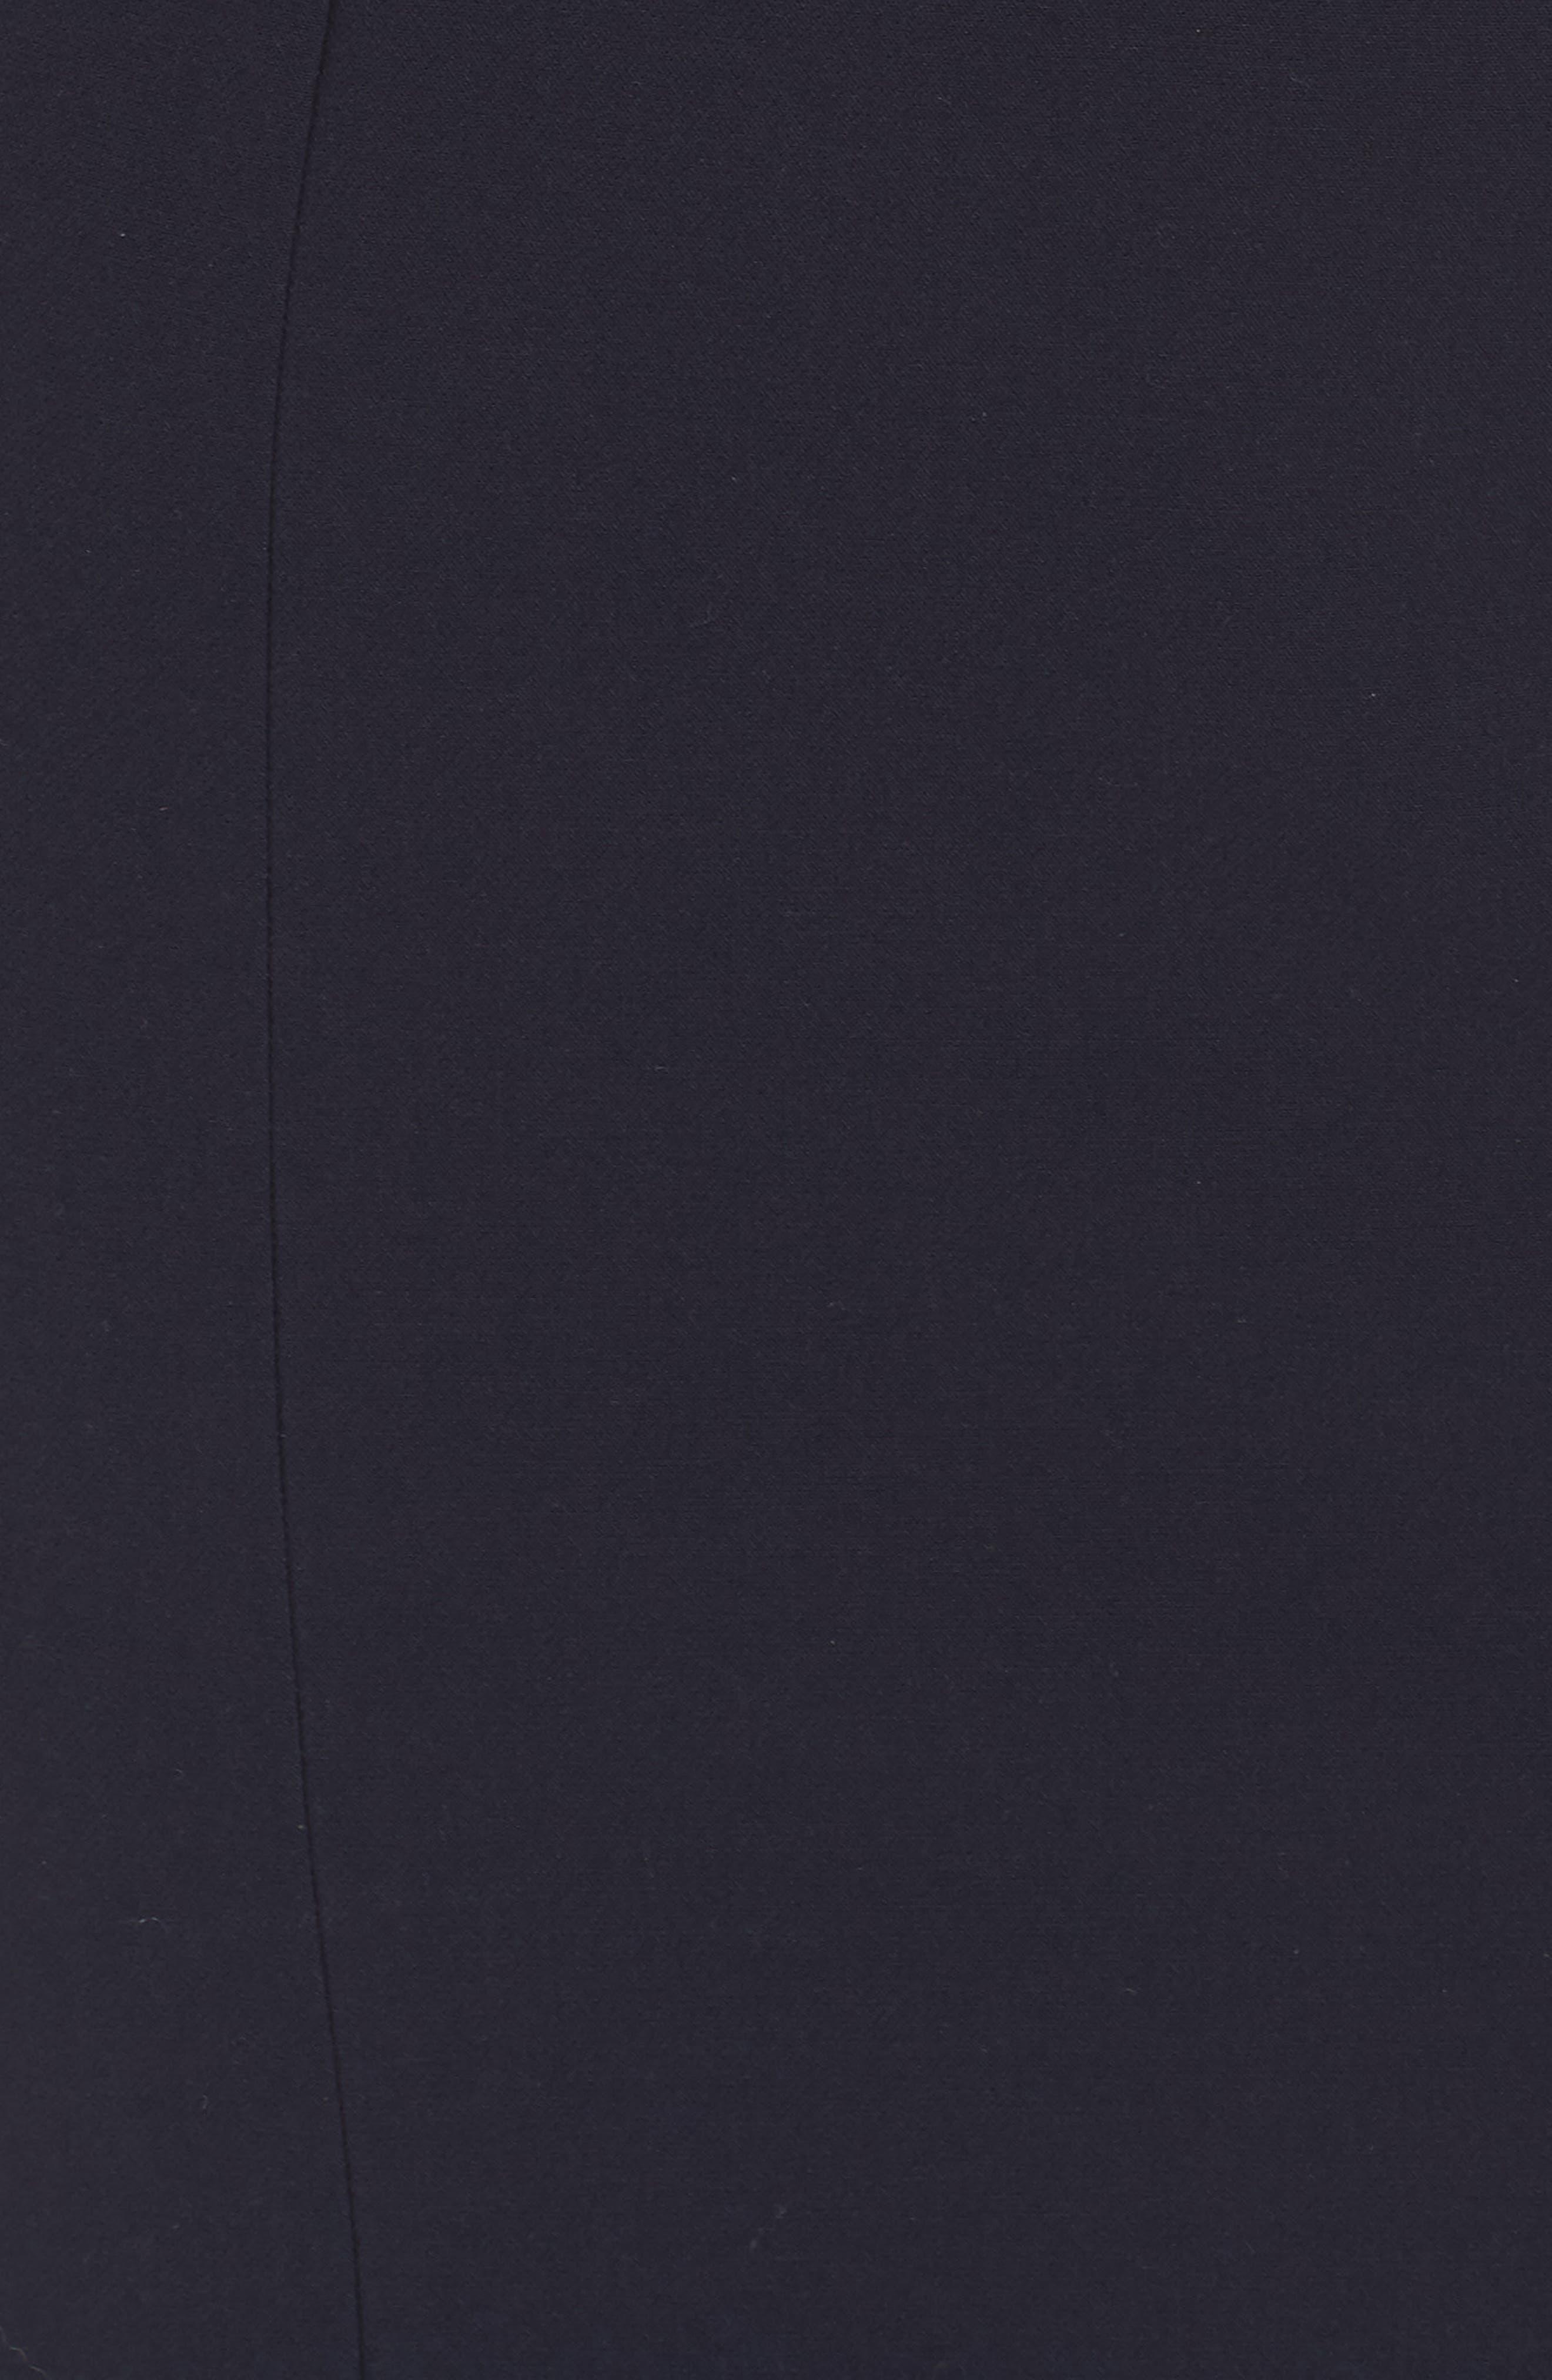 Star Neckline Crepe Sheath Dress,                             Alternate thumbnail 7, color,                             DARK NAVY